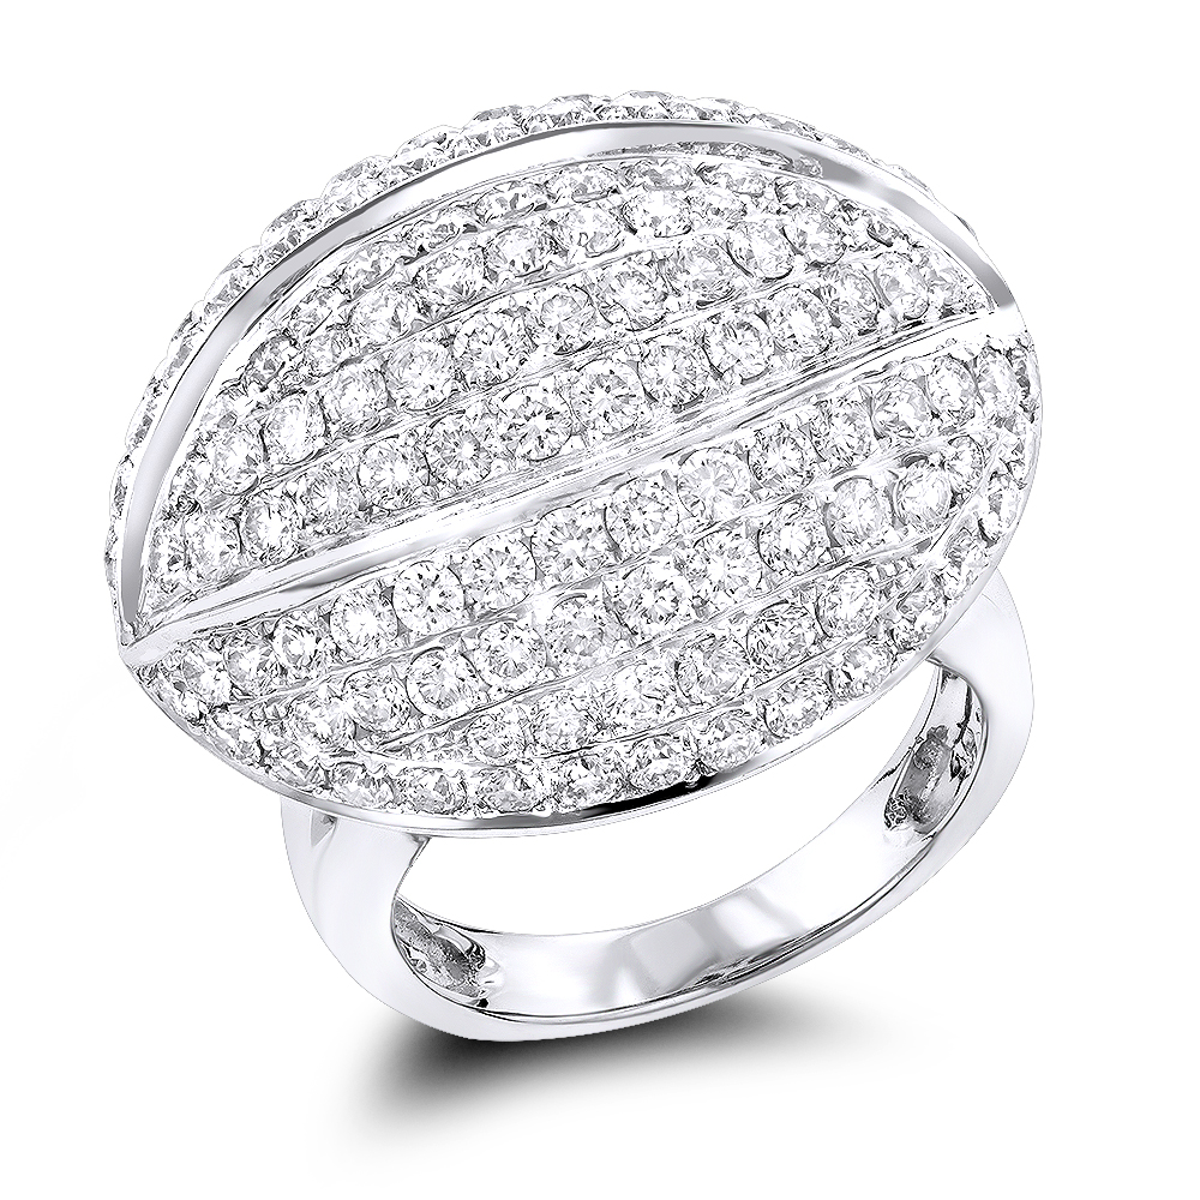 14K Gold Diamond Cocktail Ring 4.53ct